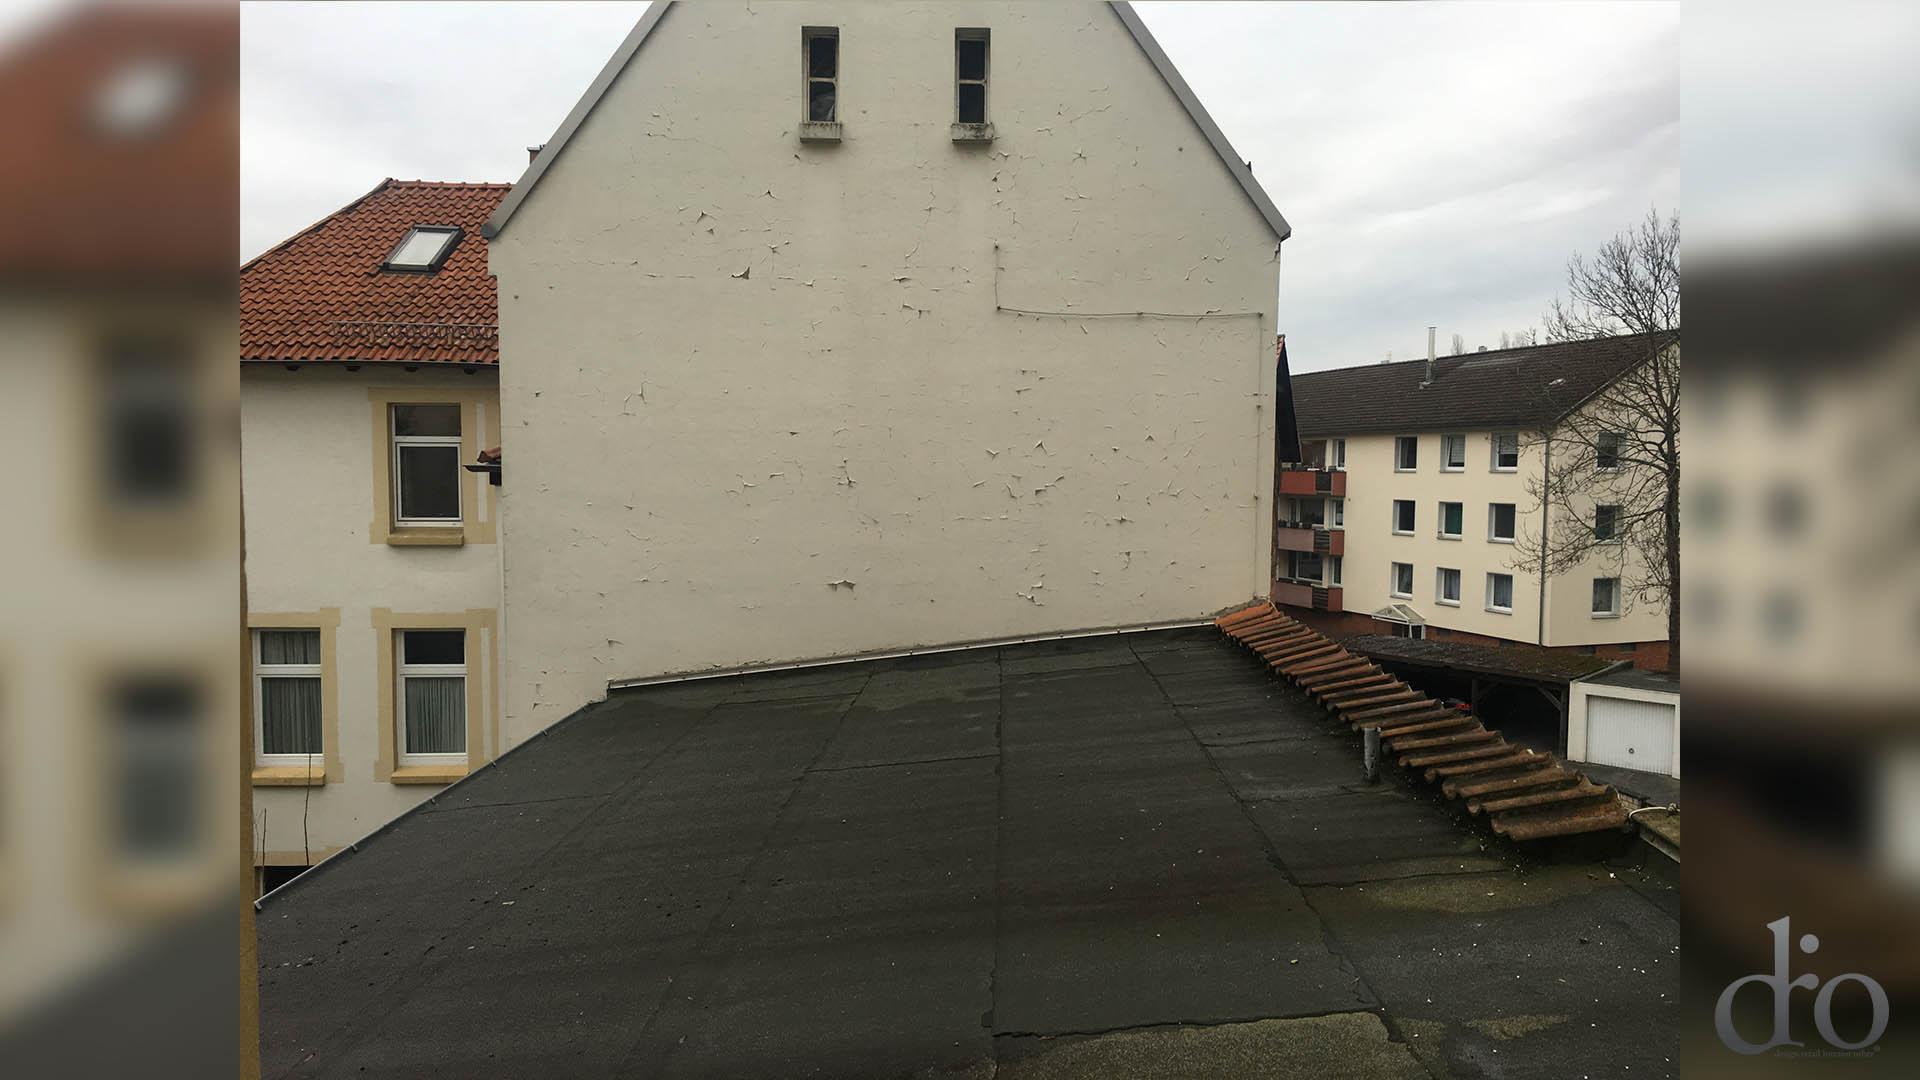 Innenarchitektur Hannover hannover innenarchitektur innenarchitektur hannover studium